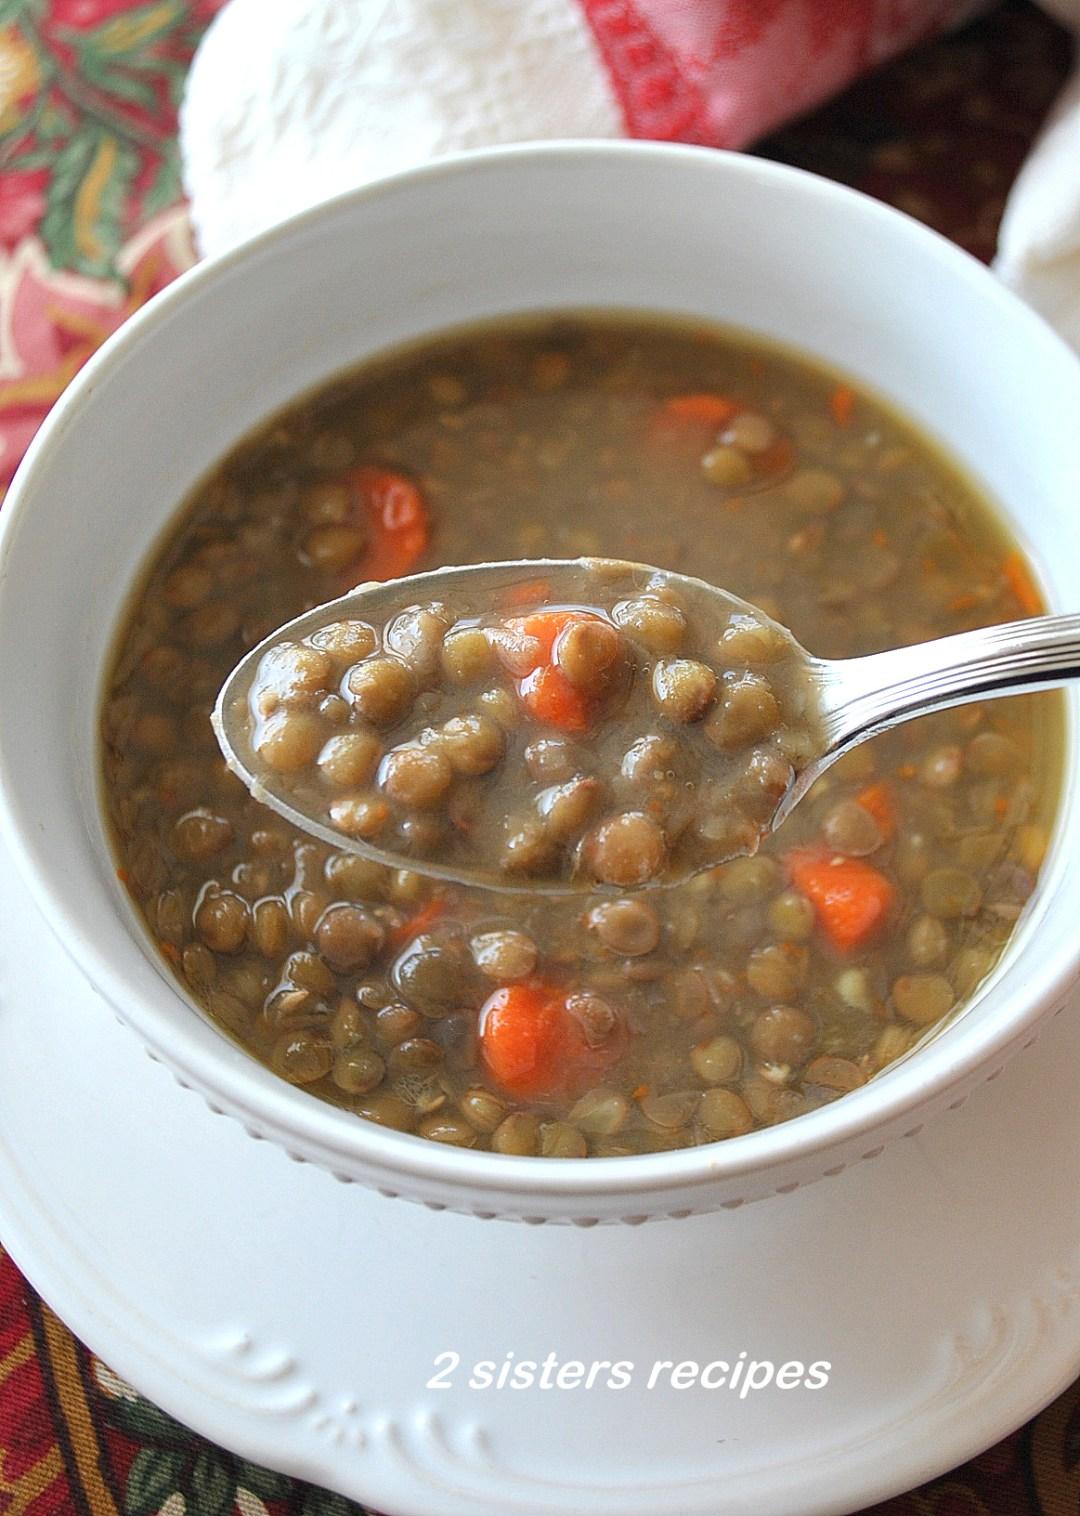 Low-Fat Lentil Soup with Veggies by 2sistersrecipes.com